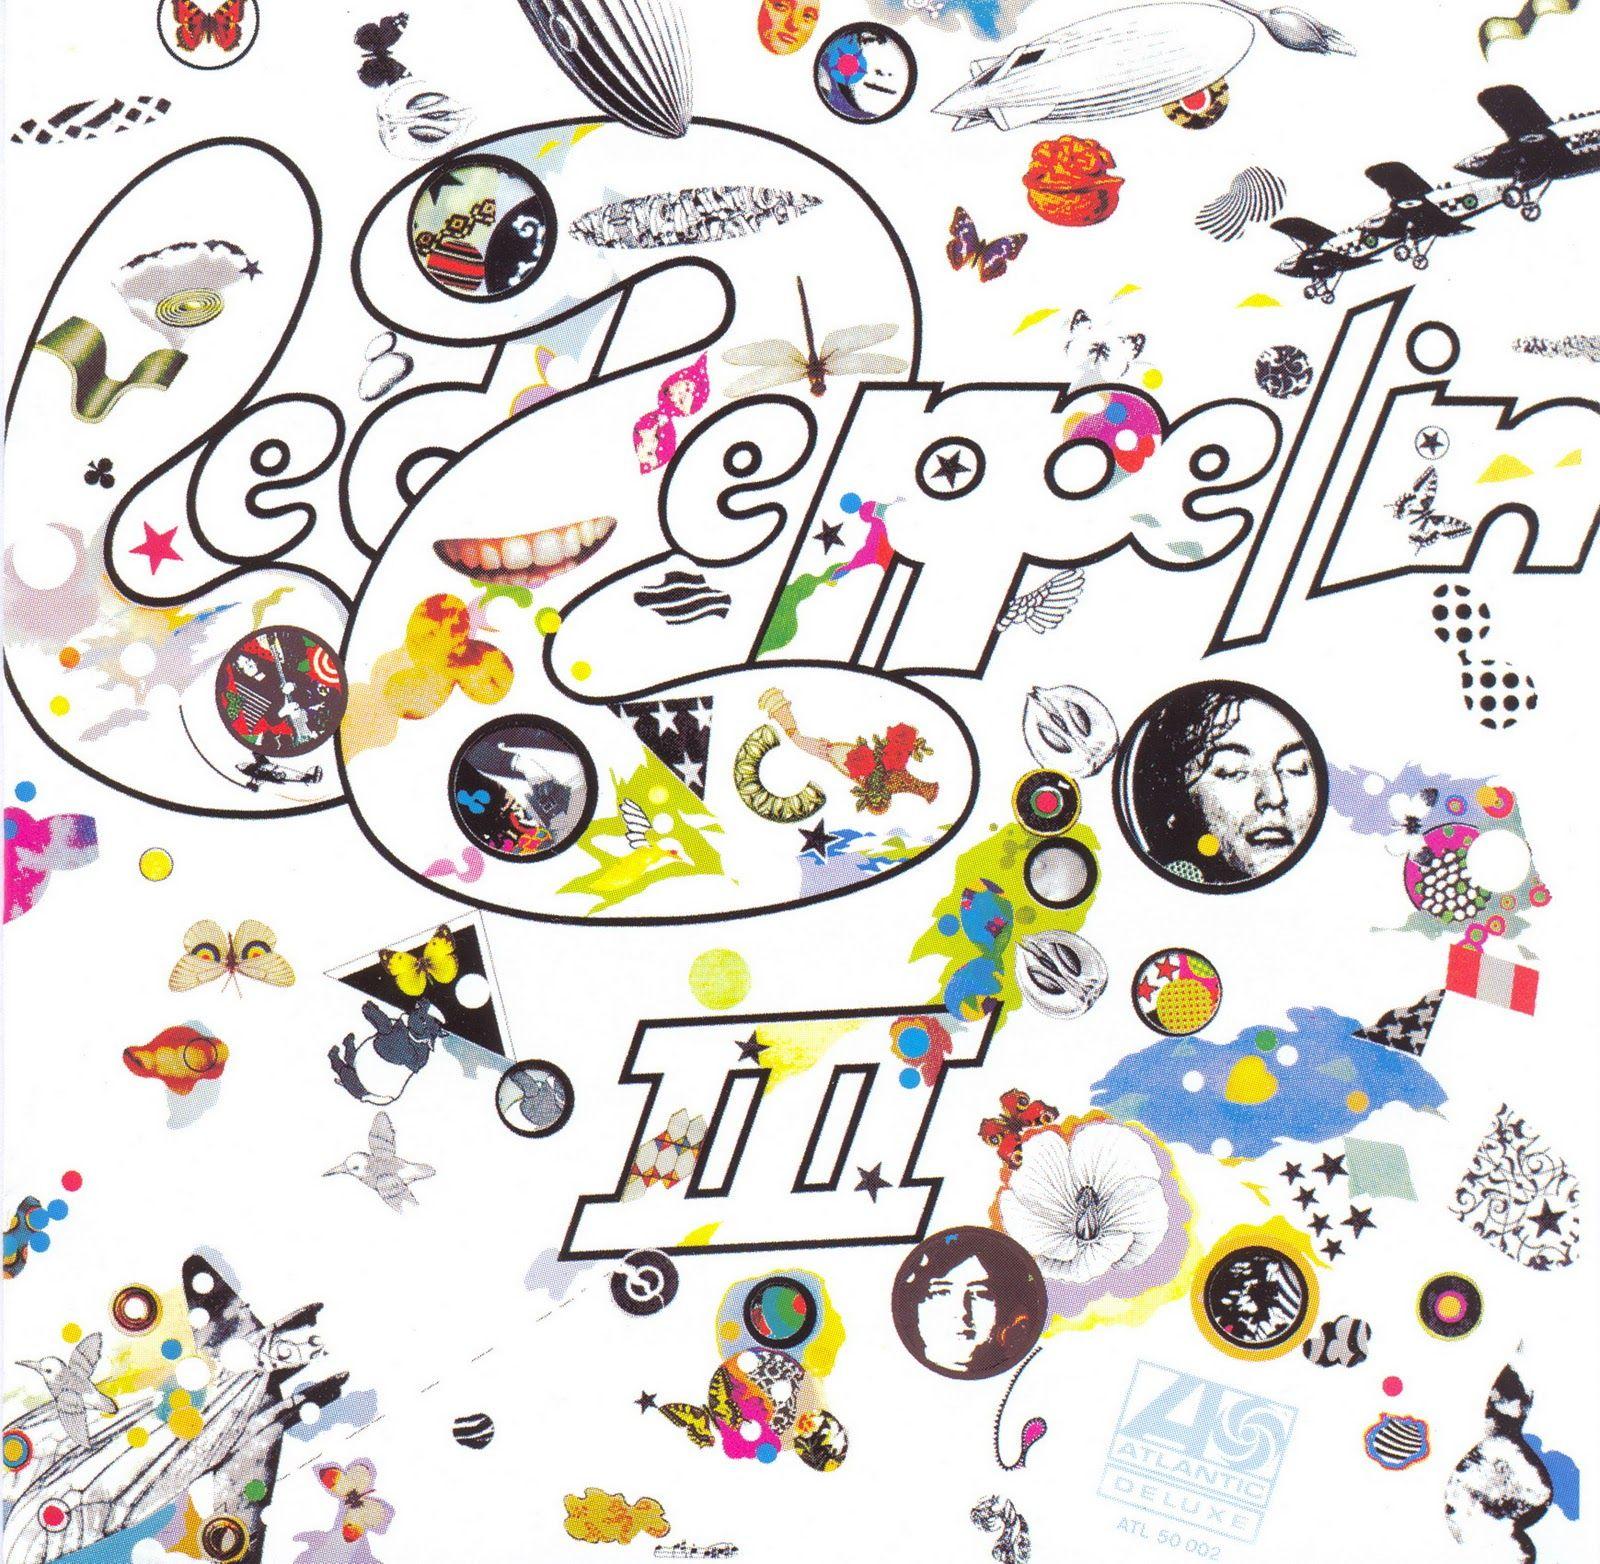 Led Zeppelin Iii Reissue Led Zeppelin Iii Led